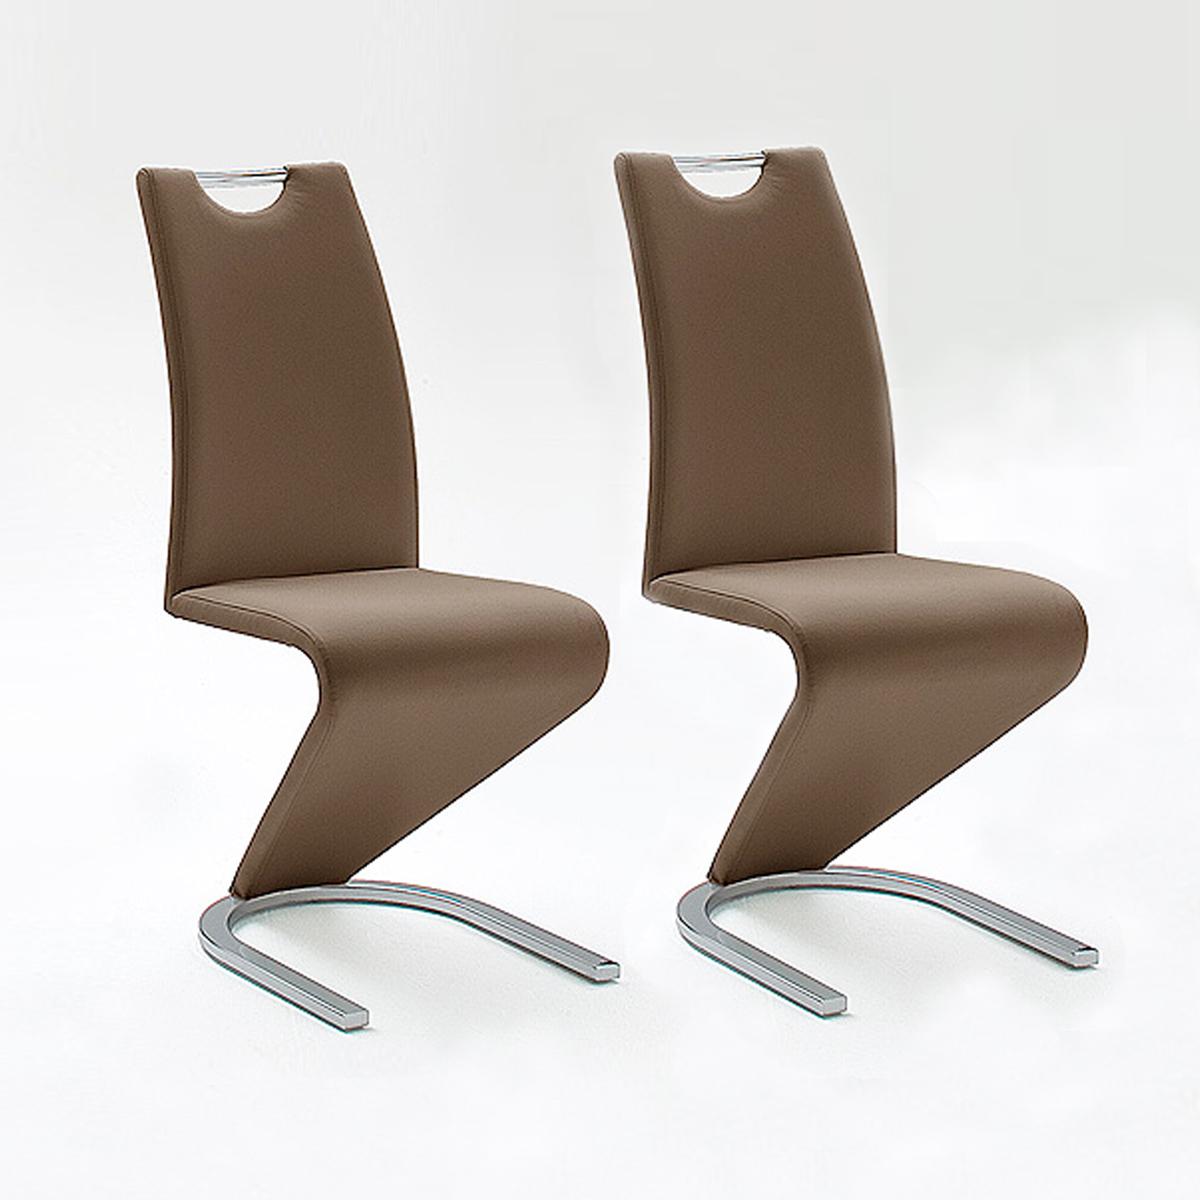 Schwingstuhl amado 2er set freischwinger esszimmer stuhl for Schwingstuhl cappuccino